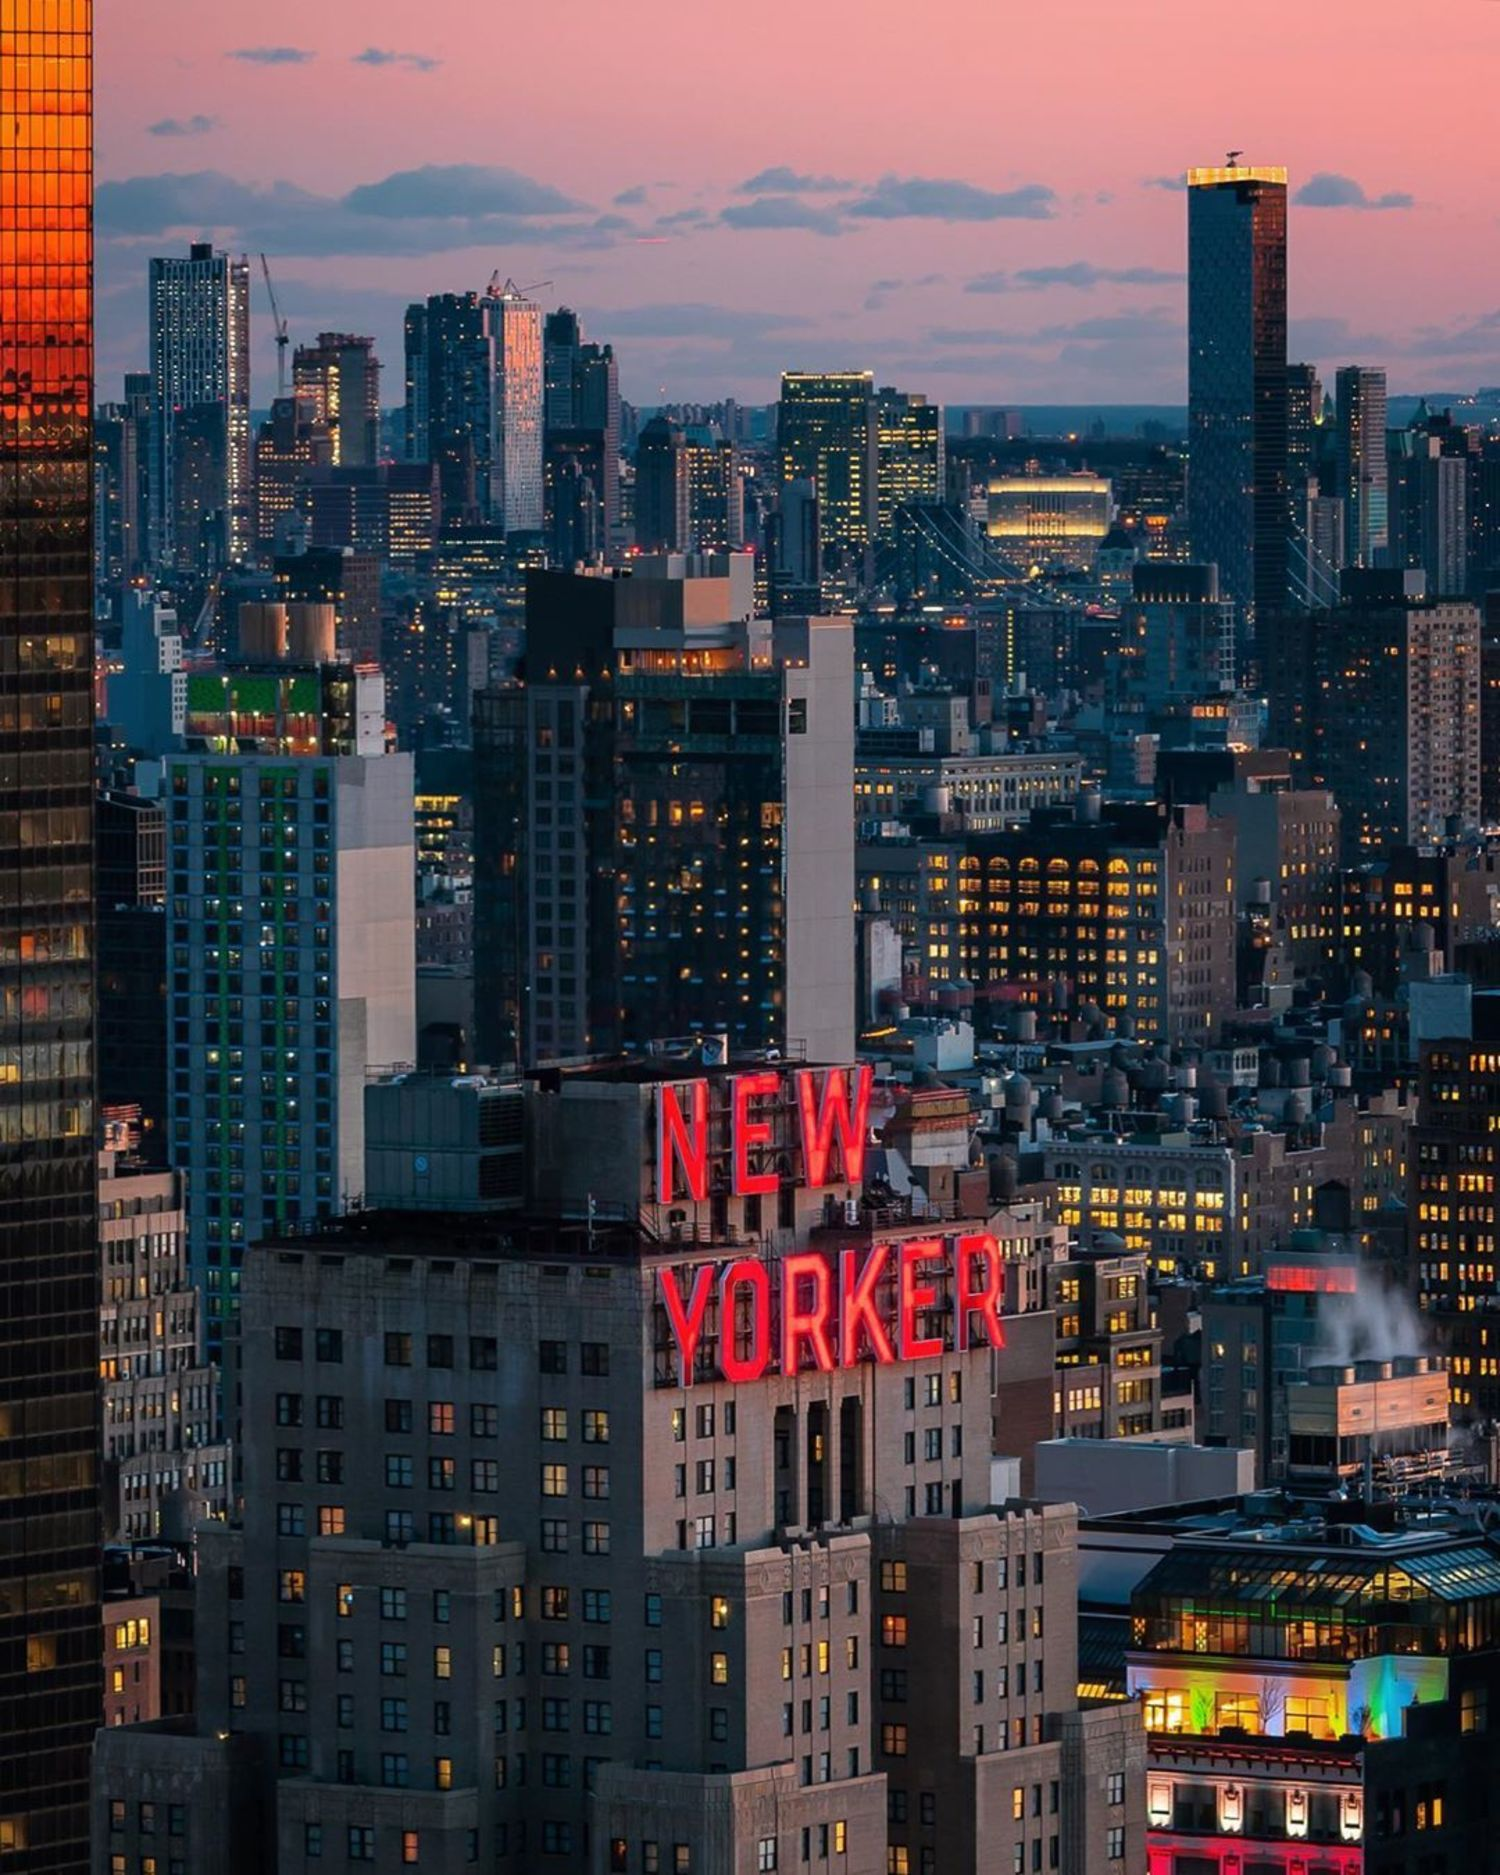 Sunset over New Yorker Hotel, Midtown, Manhattan